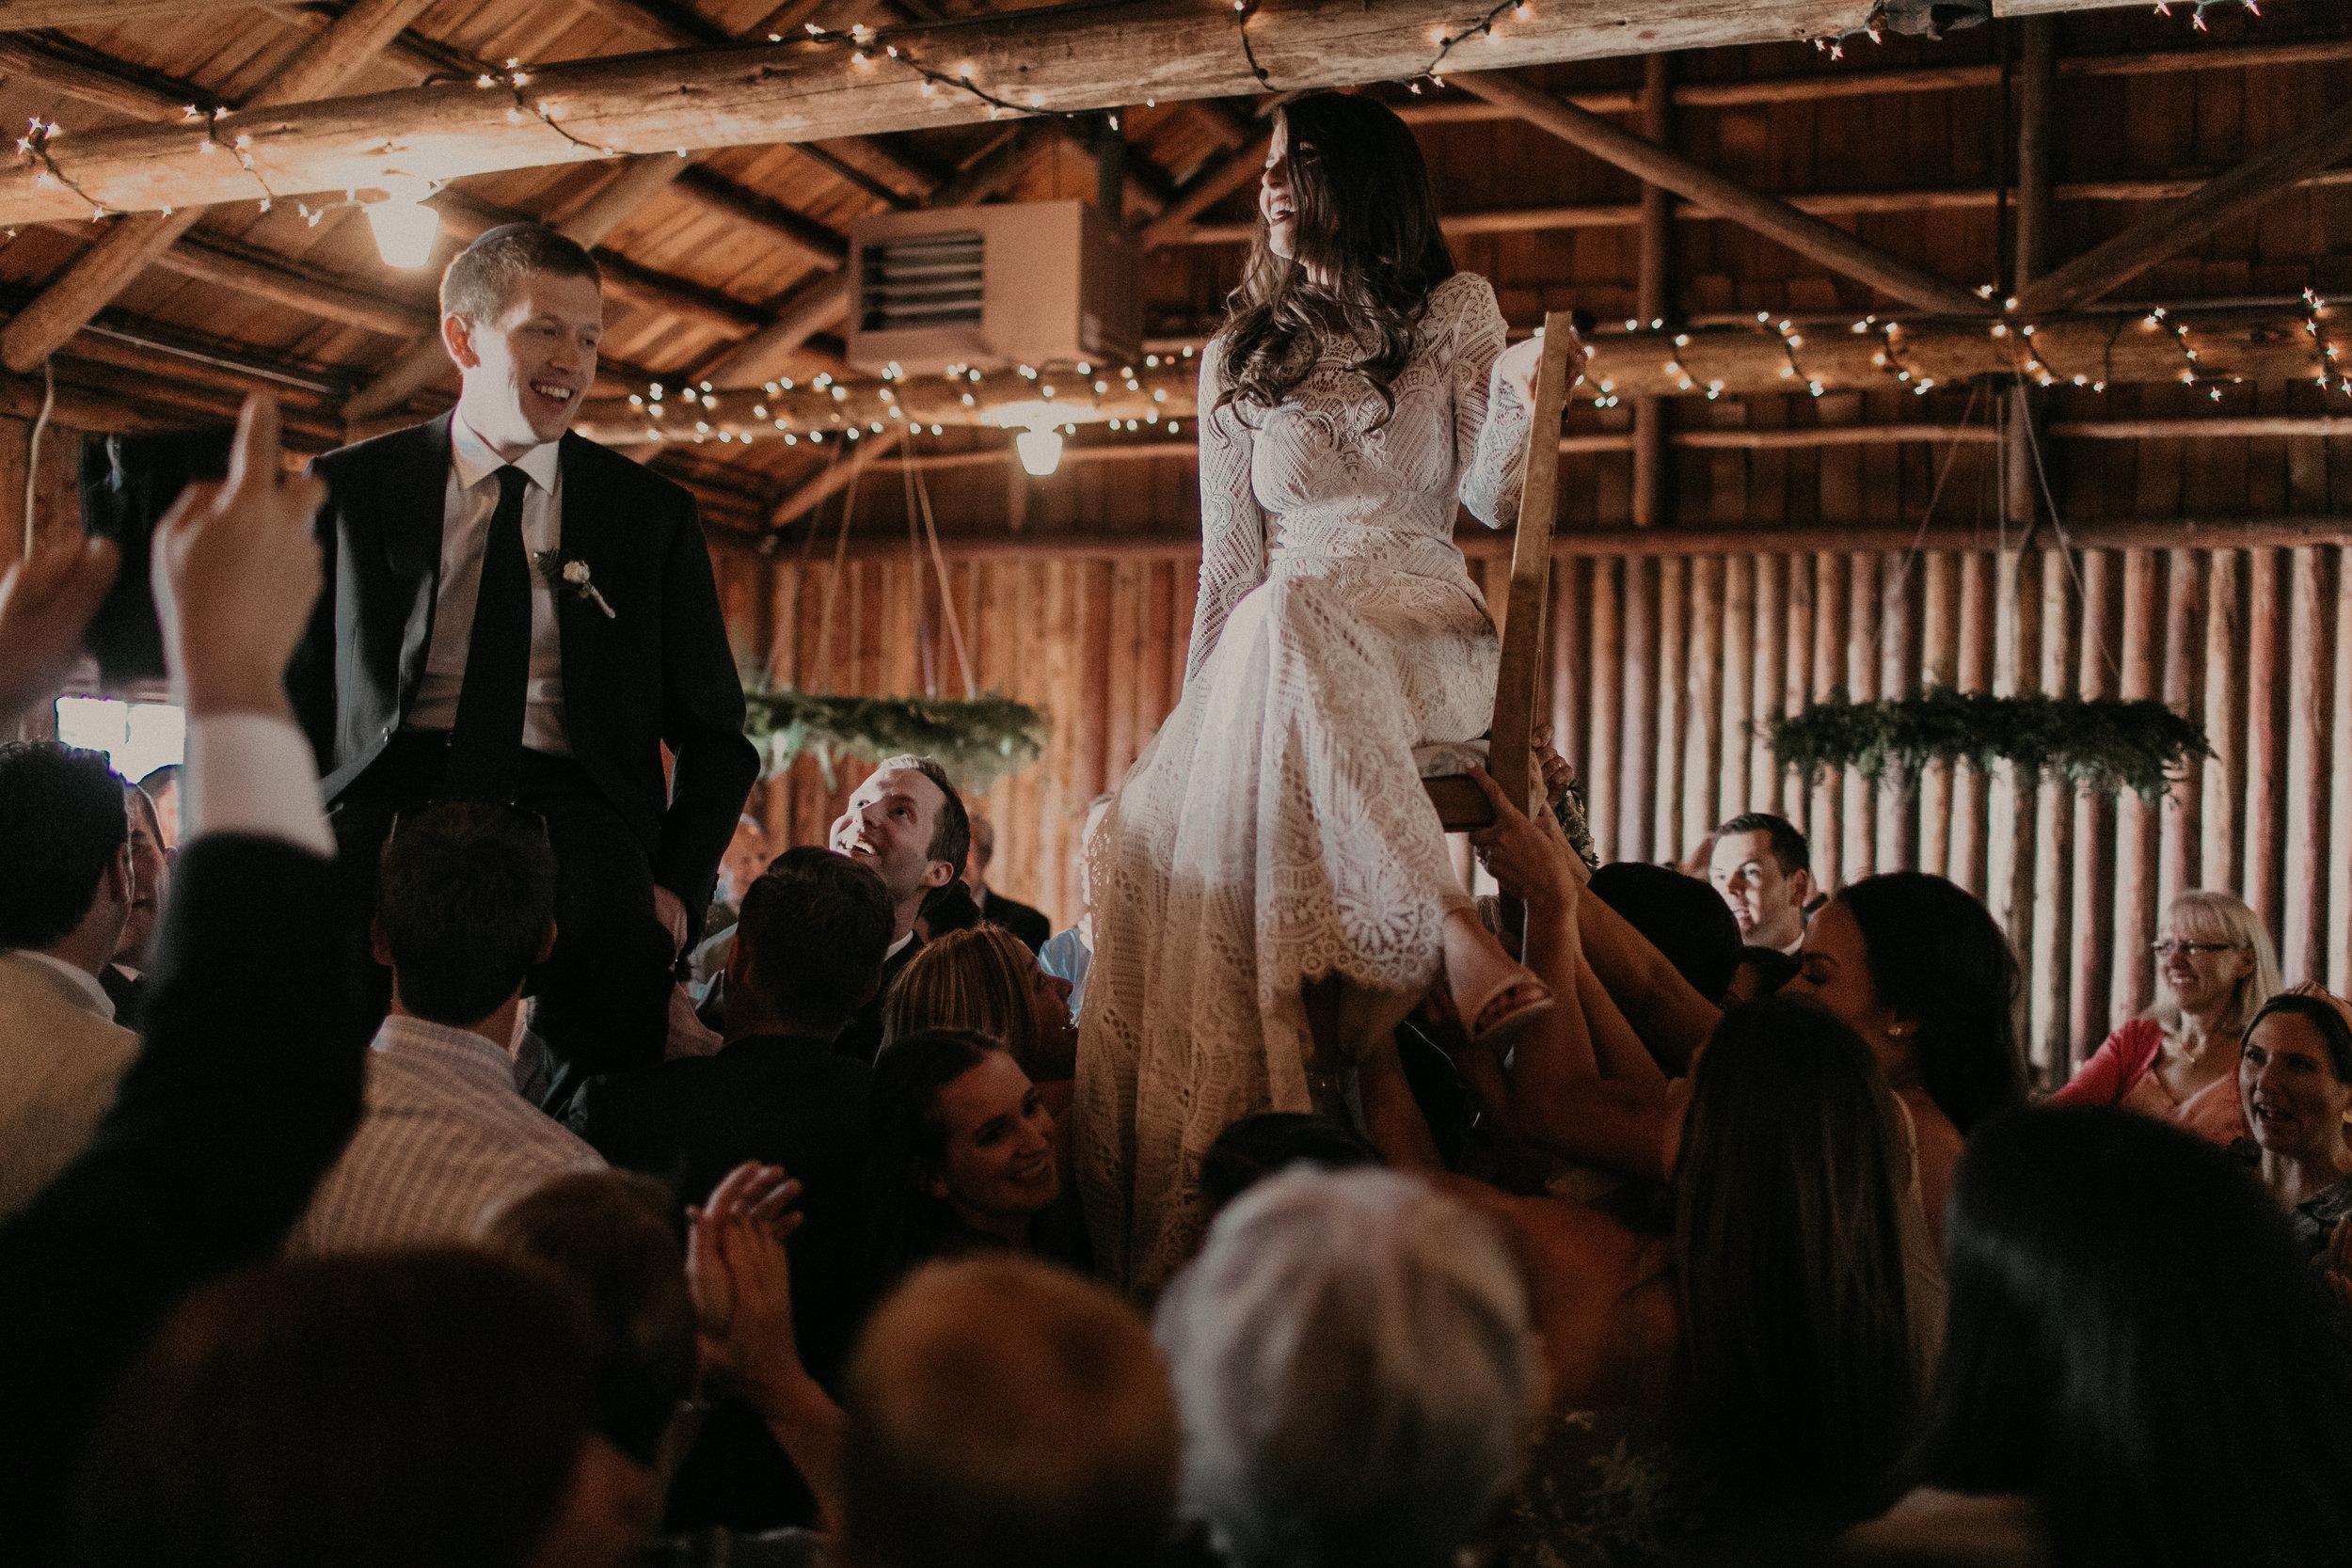 Bixby + Pine (bixby and pine) Shayna and Mark Wedding at Kitsap Memorial State Park in Poulsbo Washington, Kitsap County.